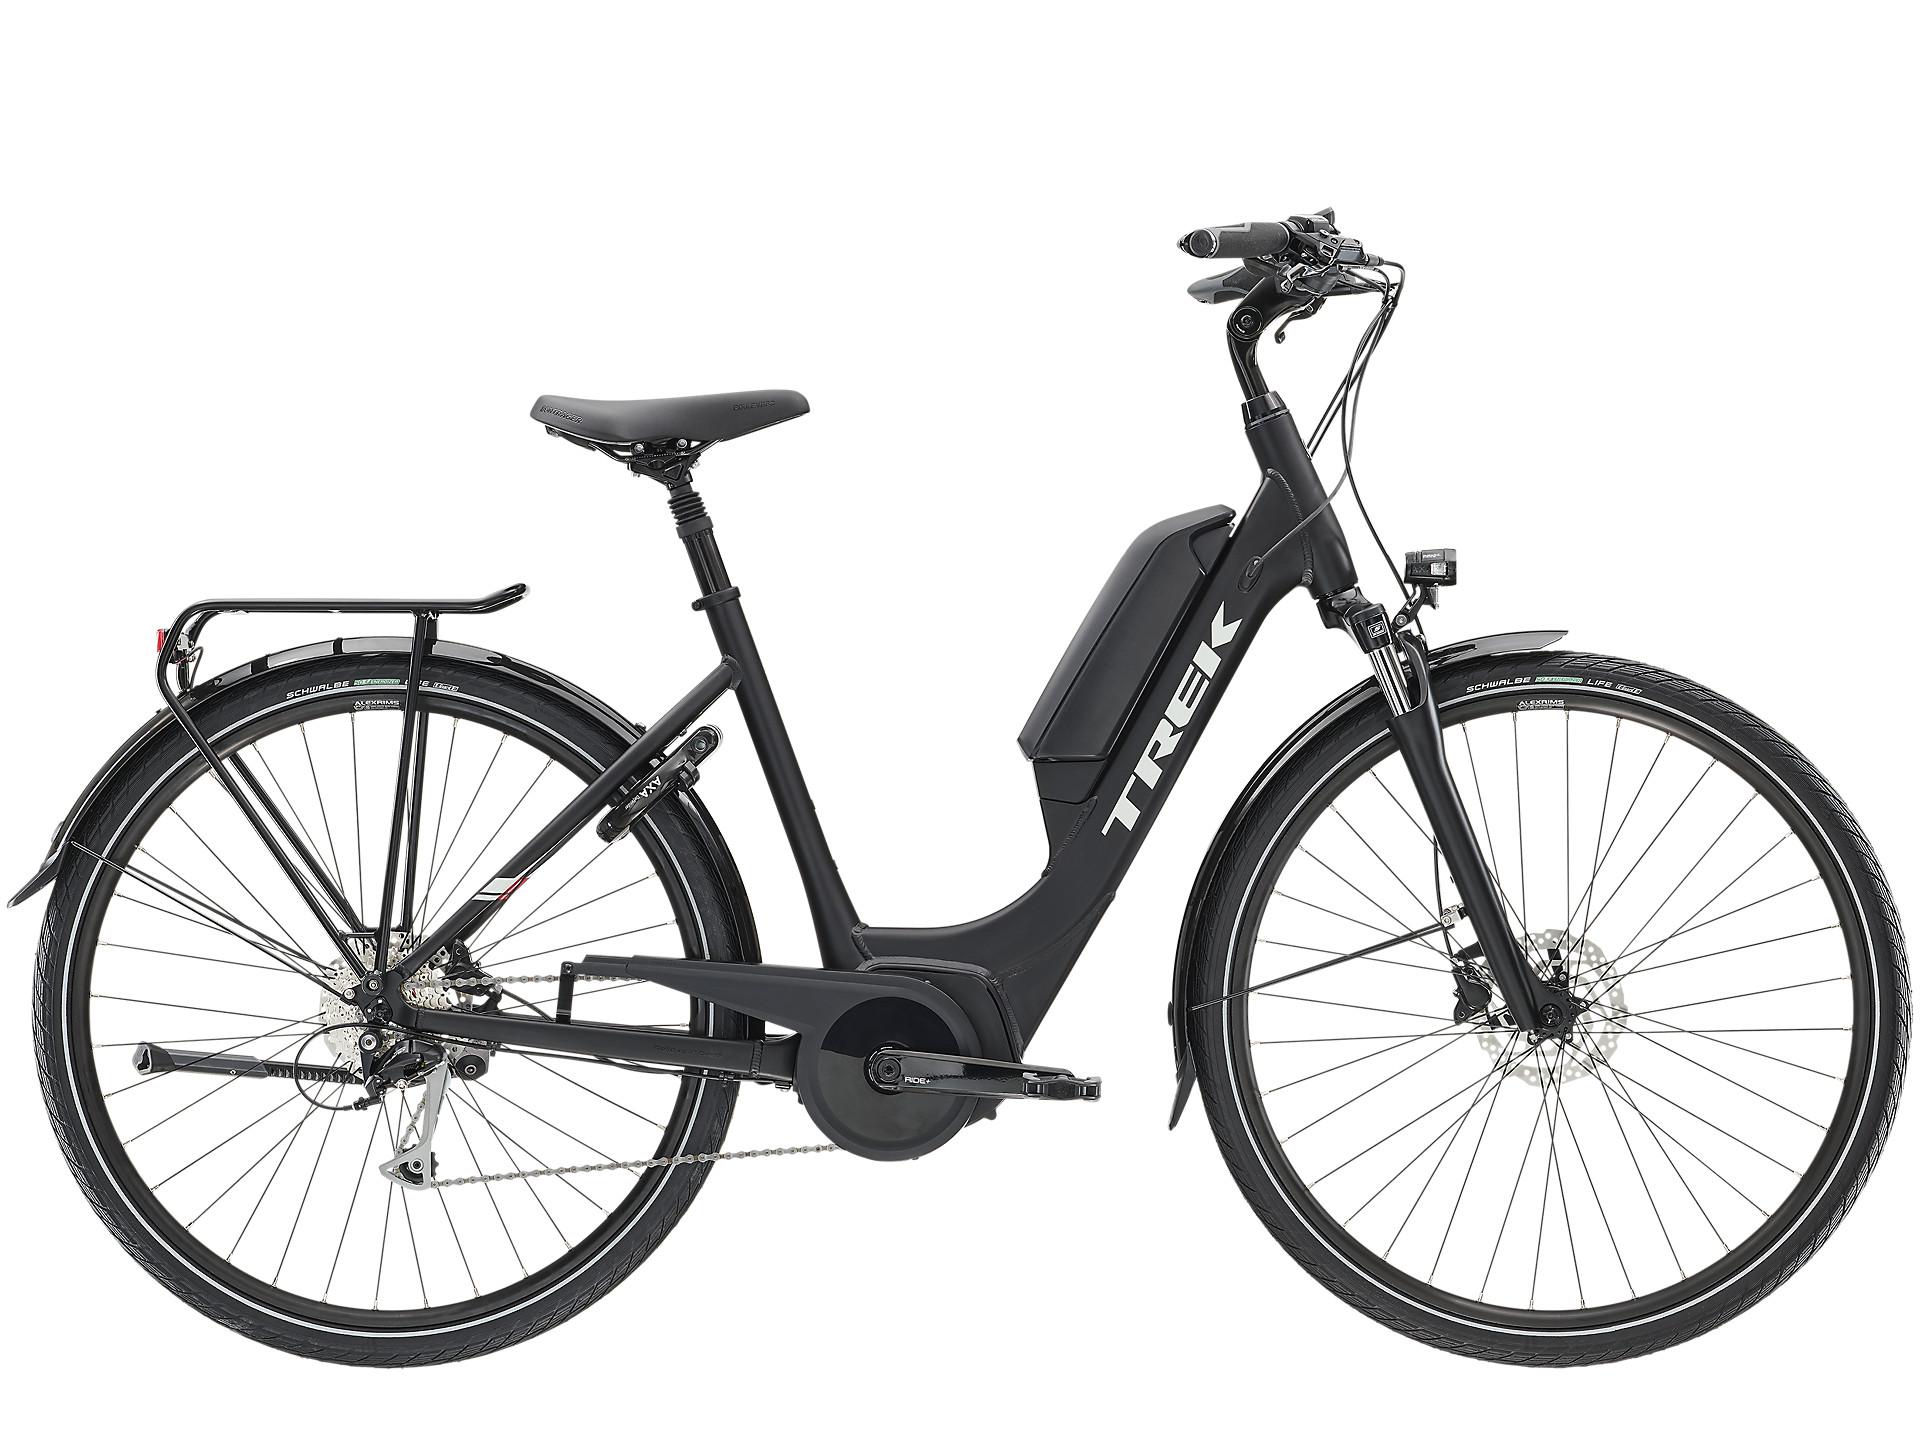 d0f06afd1a5 TM2+ Lowstep DT | Trek Bikes (GB)